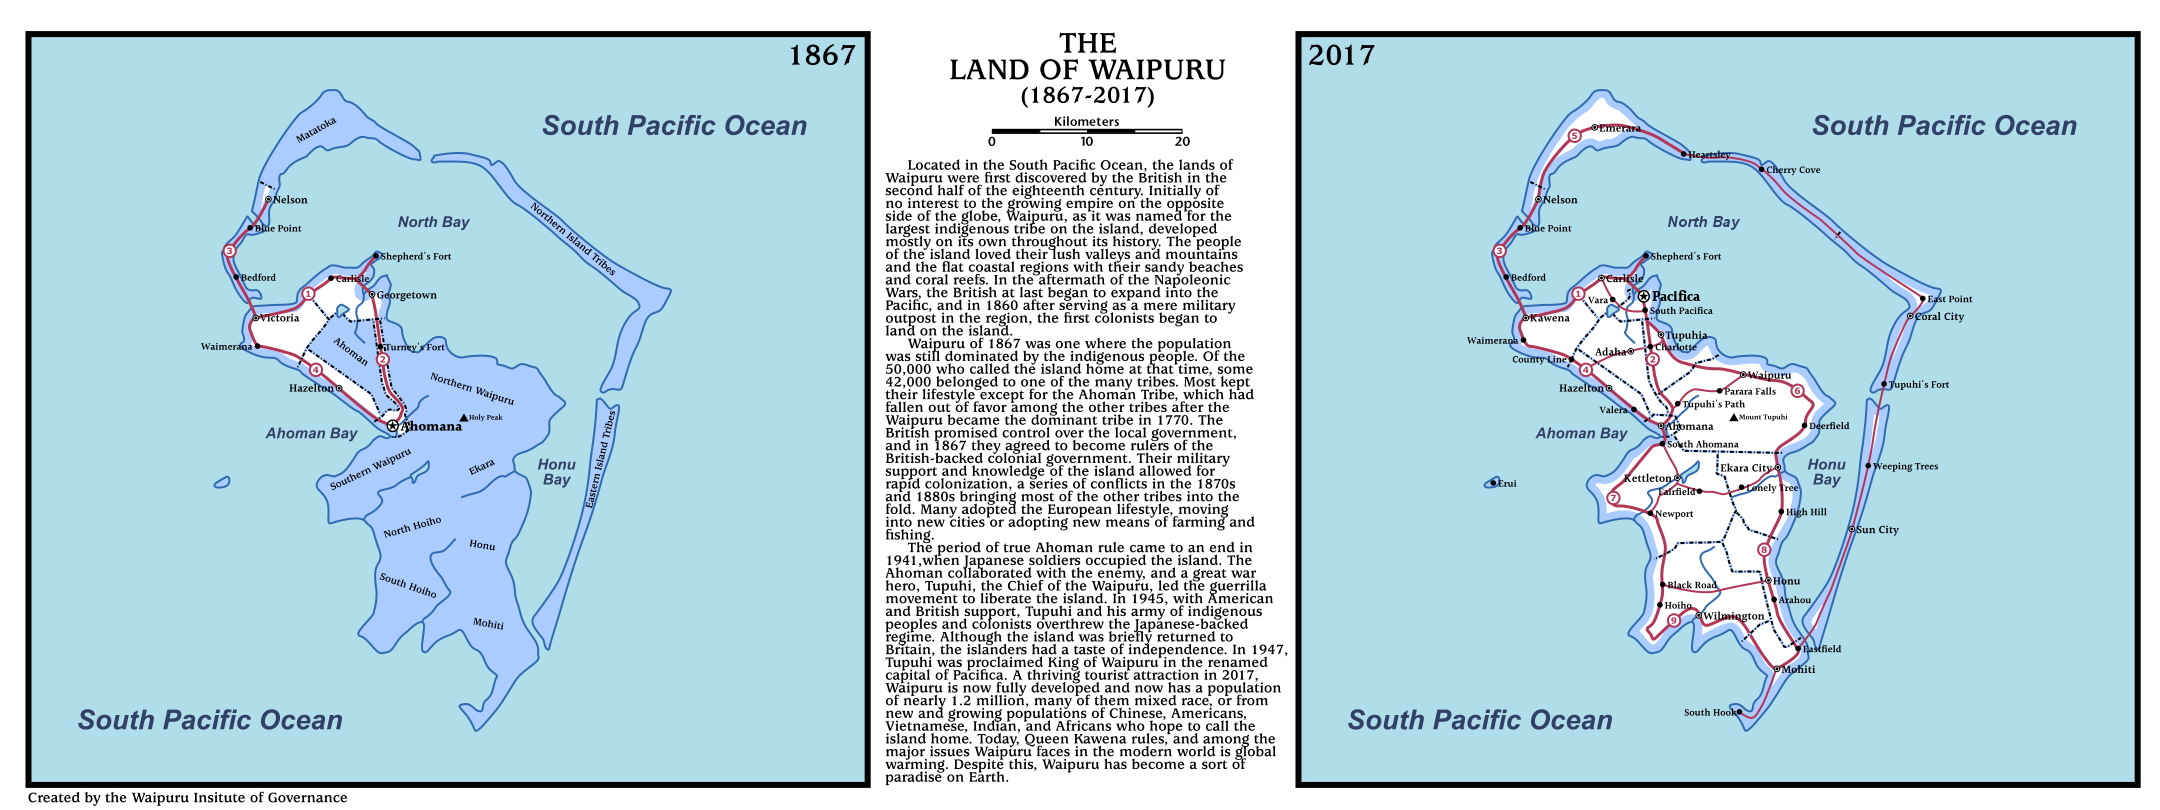 The Land of Waipuru (MotF 150: Sesquicentennial)